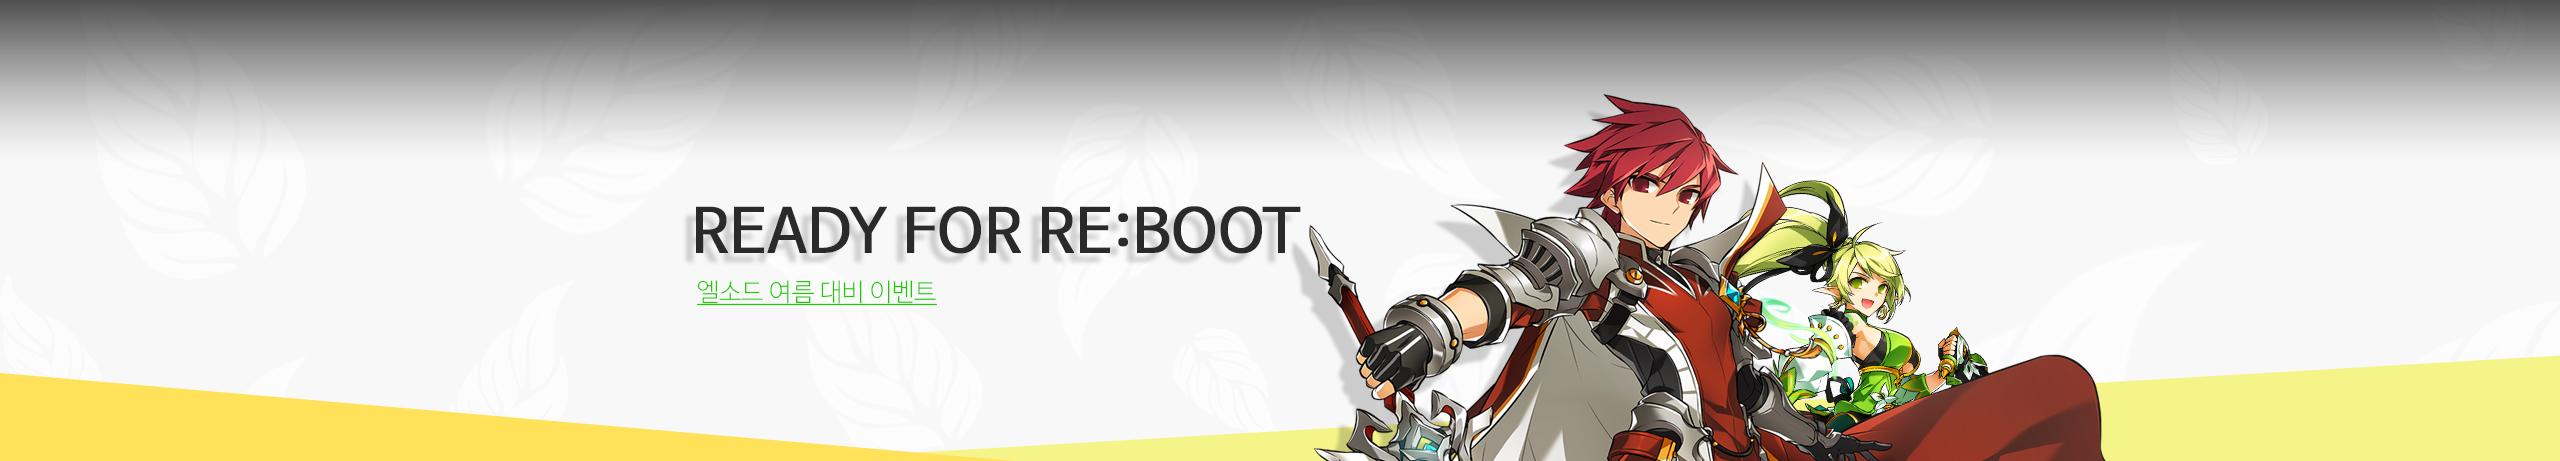 Ready for RE:BOOT (리부트 전야 이벤트) 이동